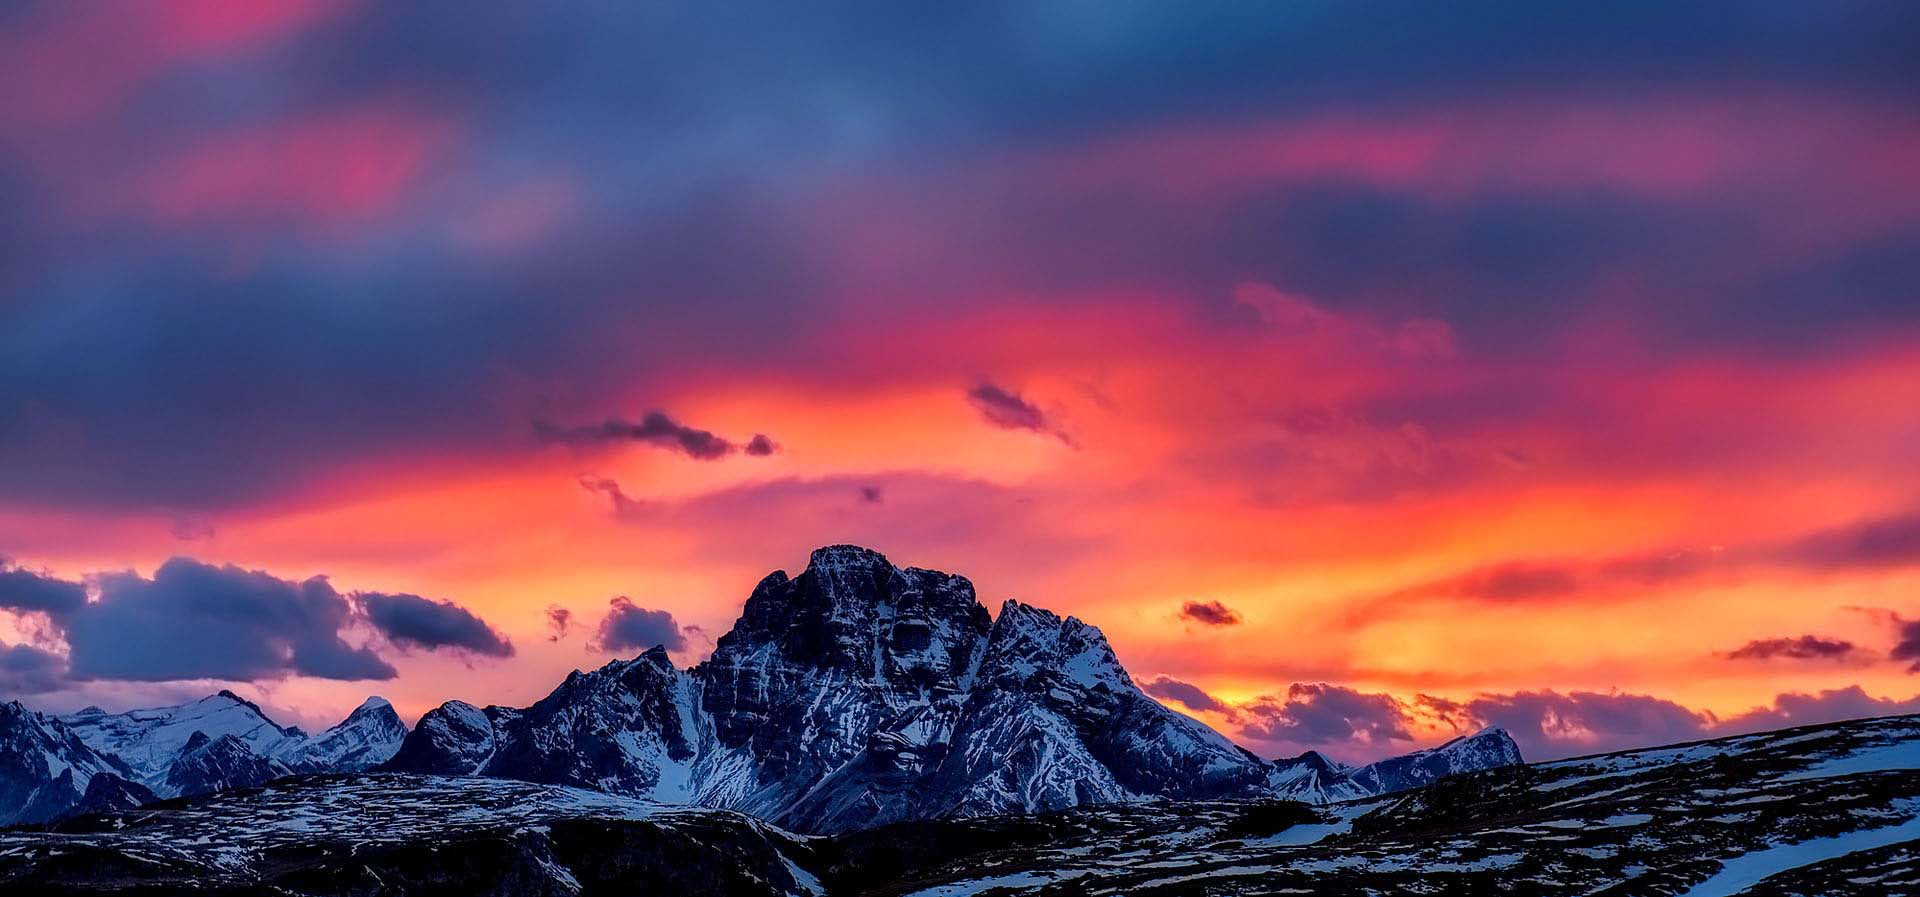 Lago, Tovel, on the road, road, Trentino, dolomiti, Lac, alpin, lake, Dolomites